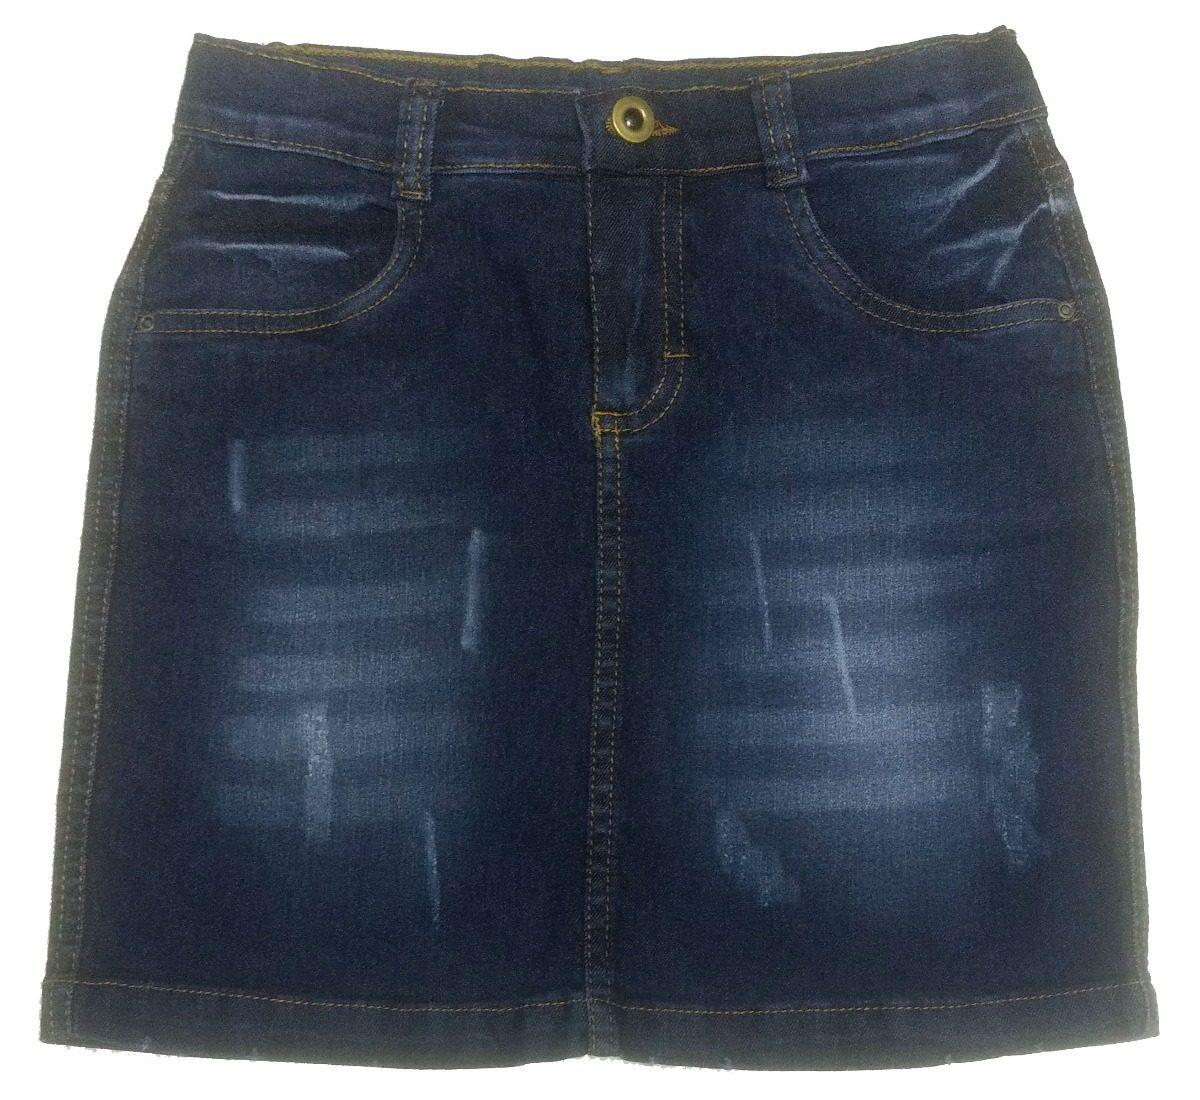 4b03a3d16 Saia Jeans Curta Juvenil Tam. 10 Ao 14 - Ref. 1210 - R$ 54,90 em ...